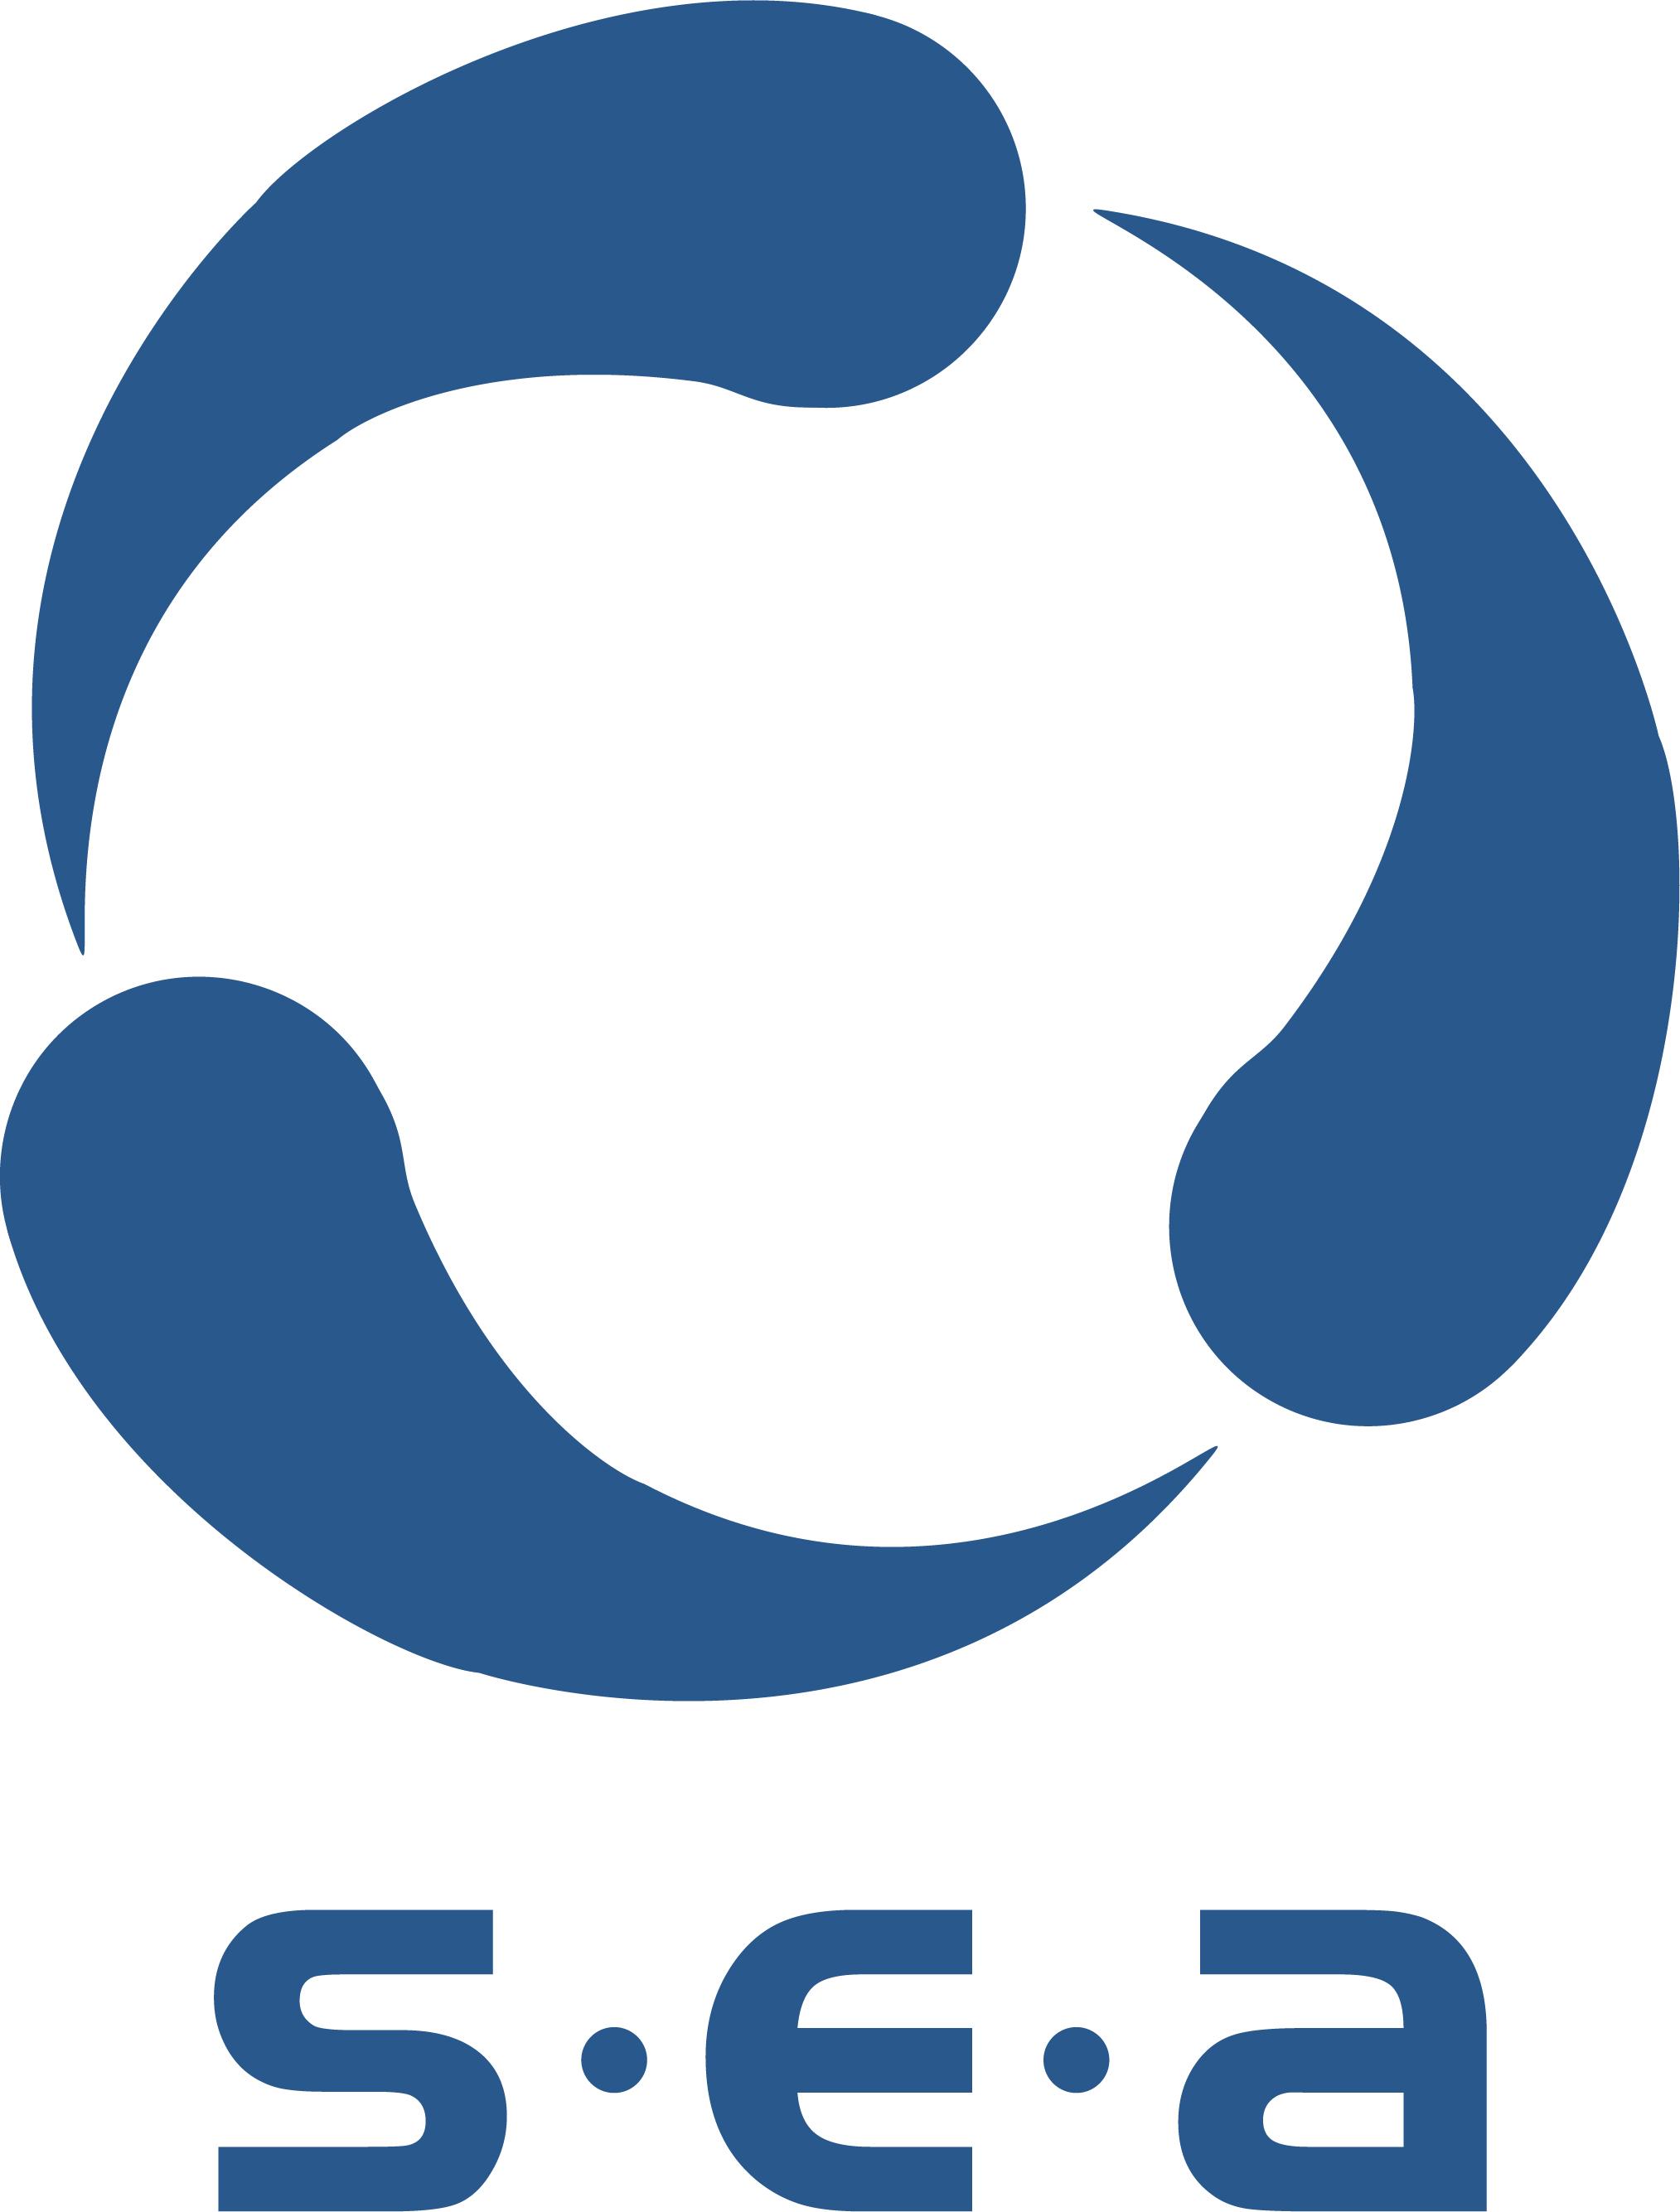 S.E.A. - Science & Engineering Applications Datentechnik GmbH